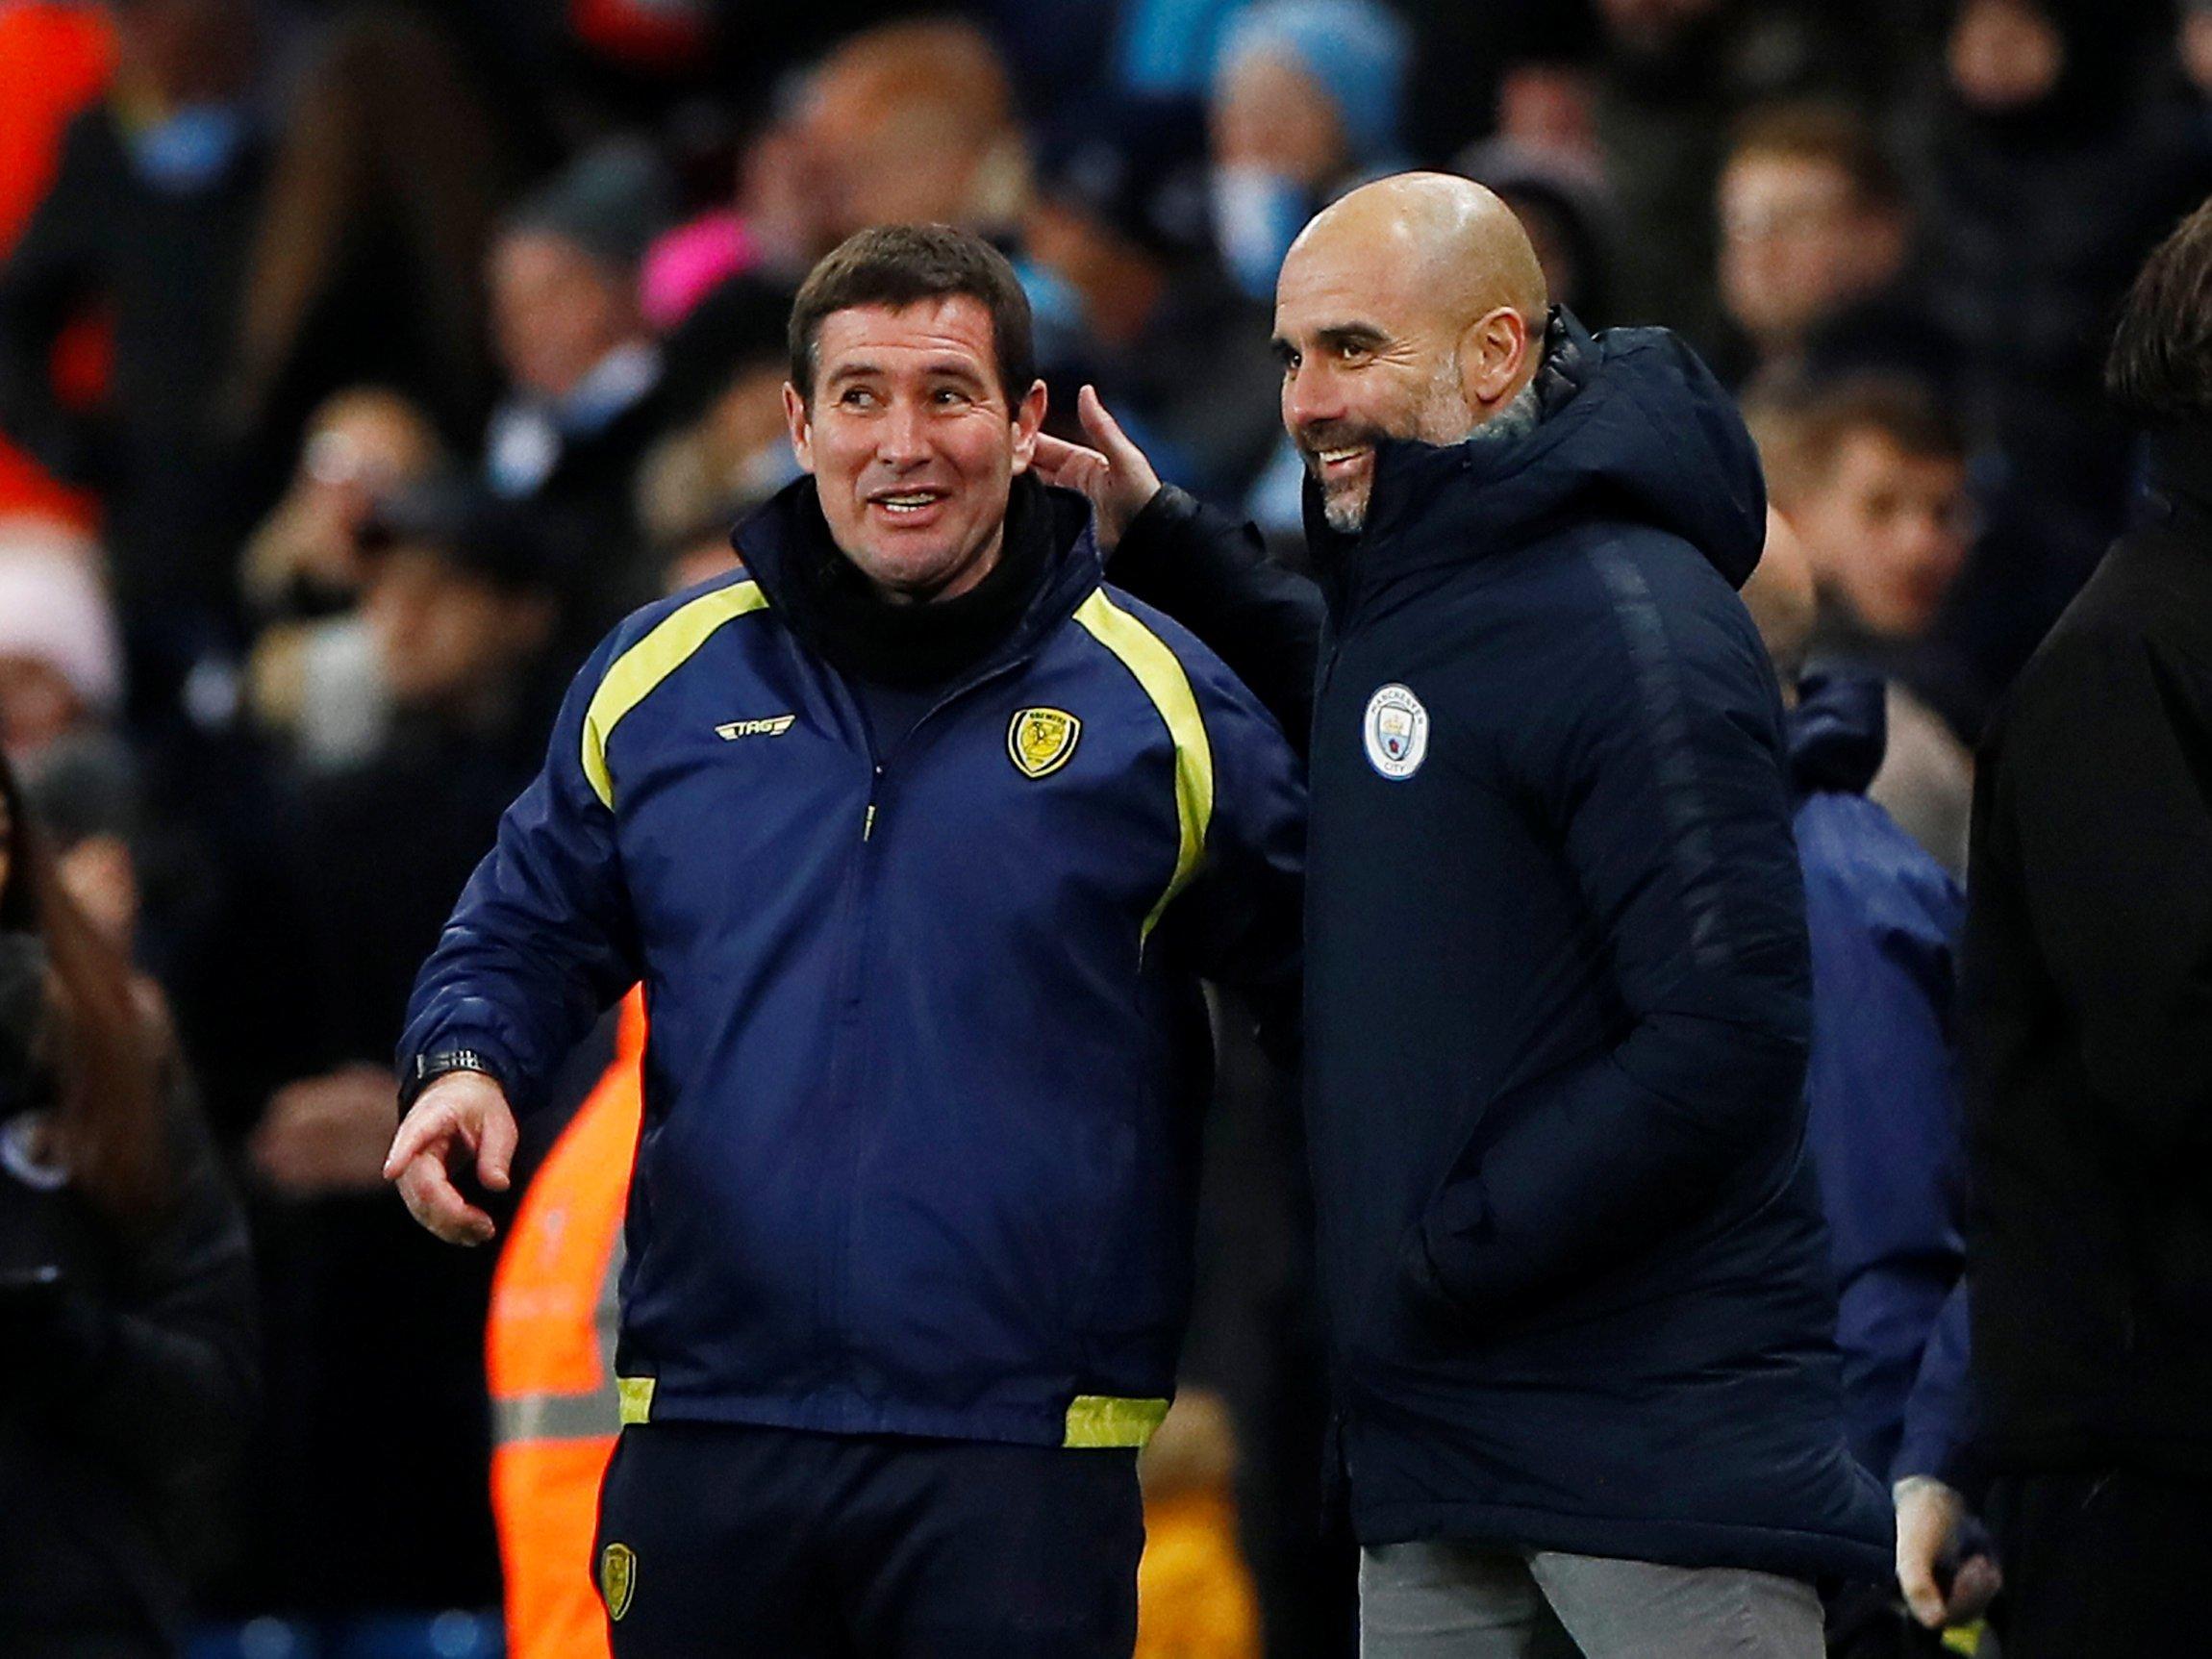 Pep Guardiola praises Burton Albion despite suffering 9-0 loss against Manchester City